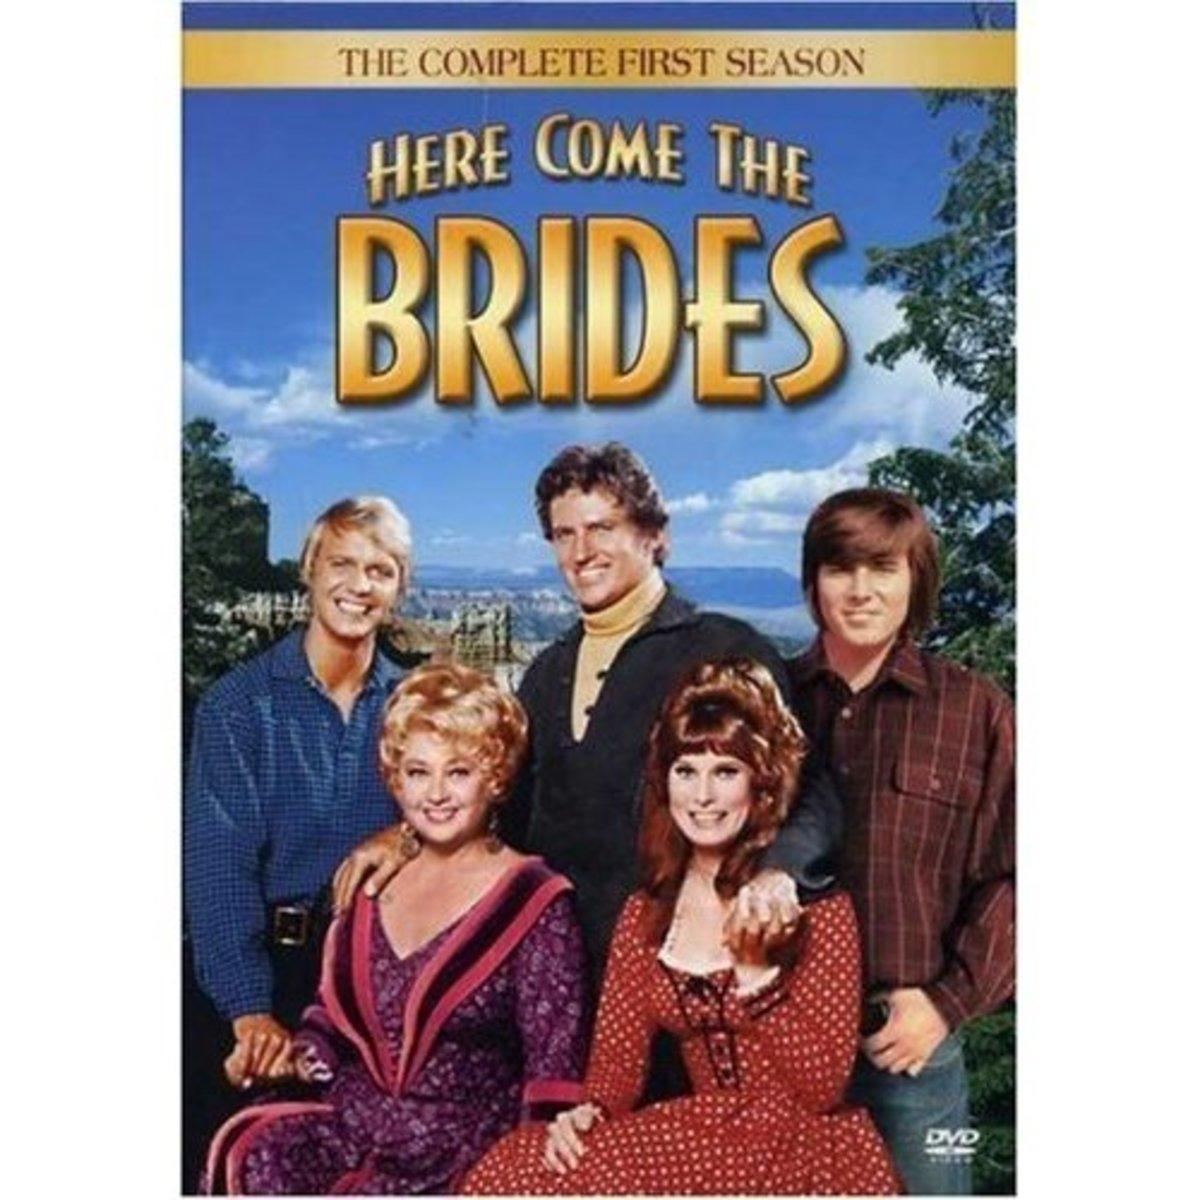 Here Come the Brides Cast